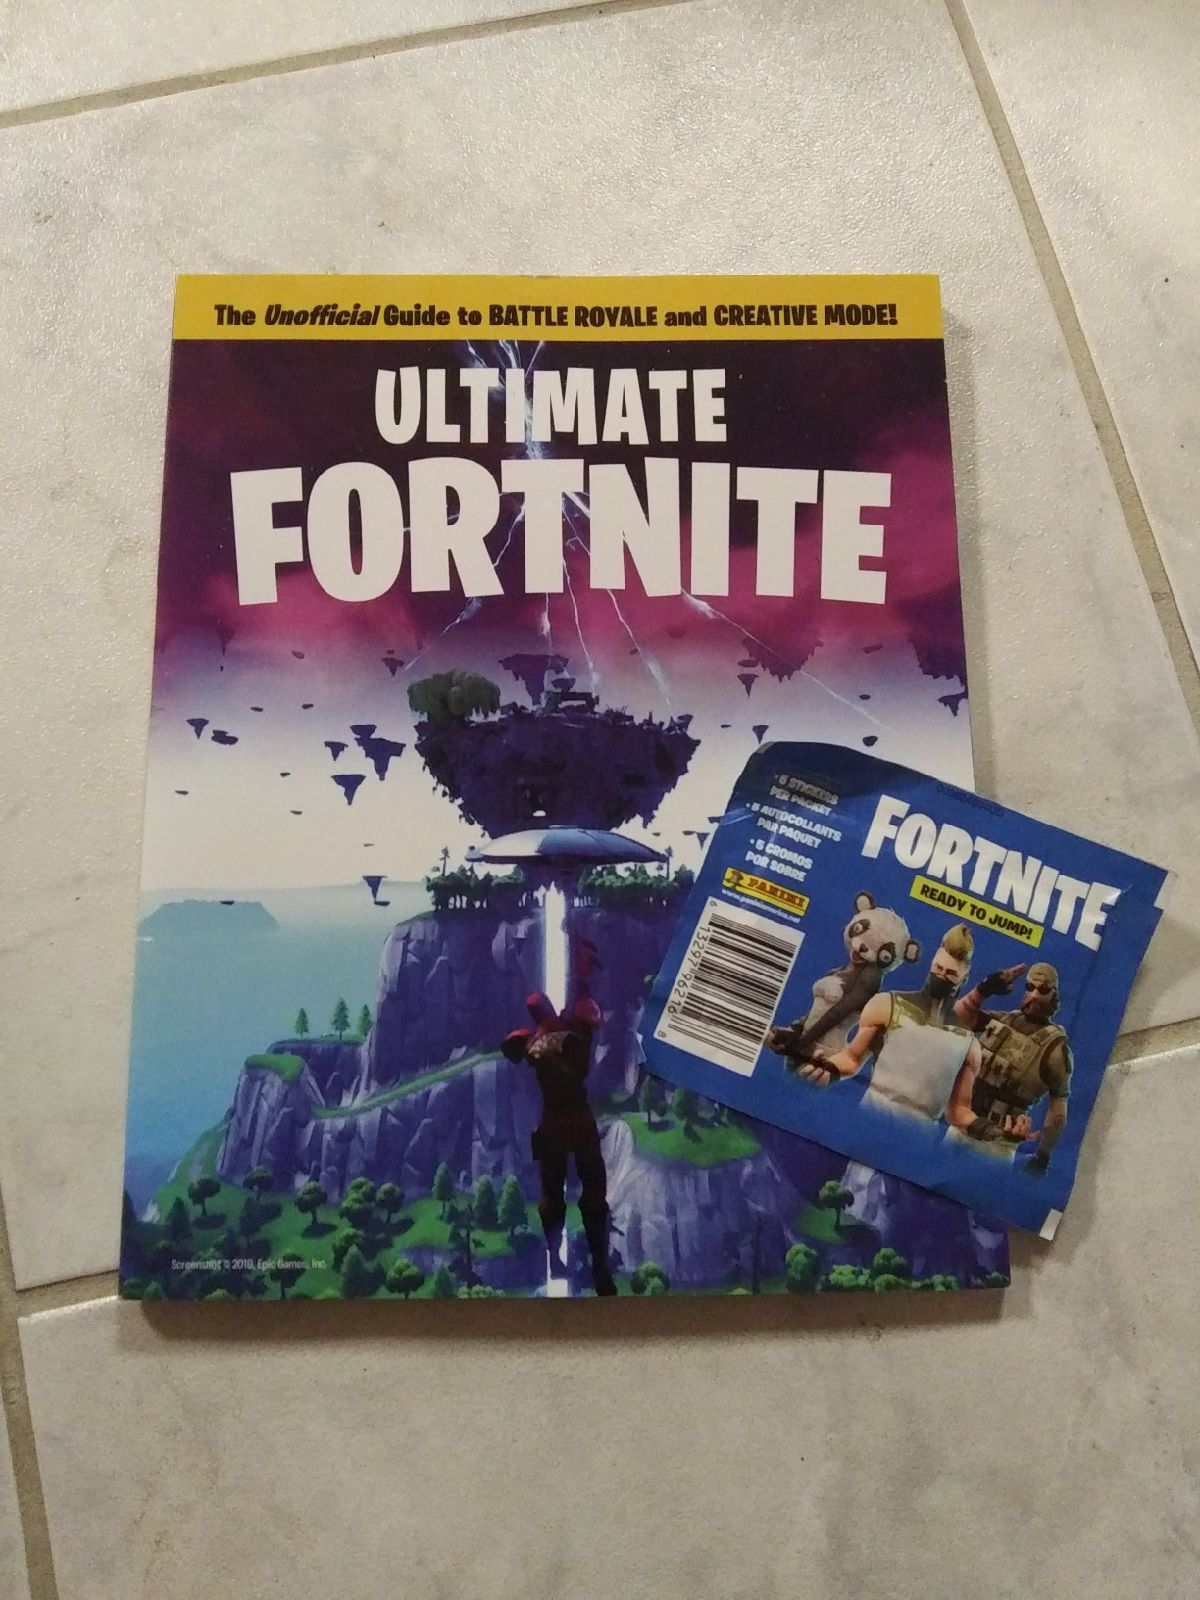 Ultimate Fortnite